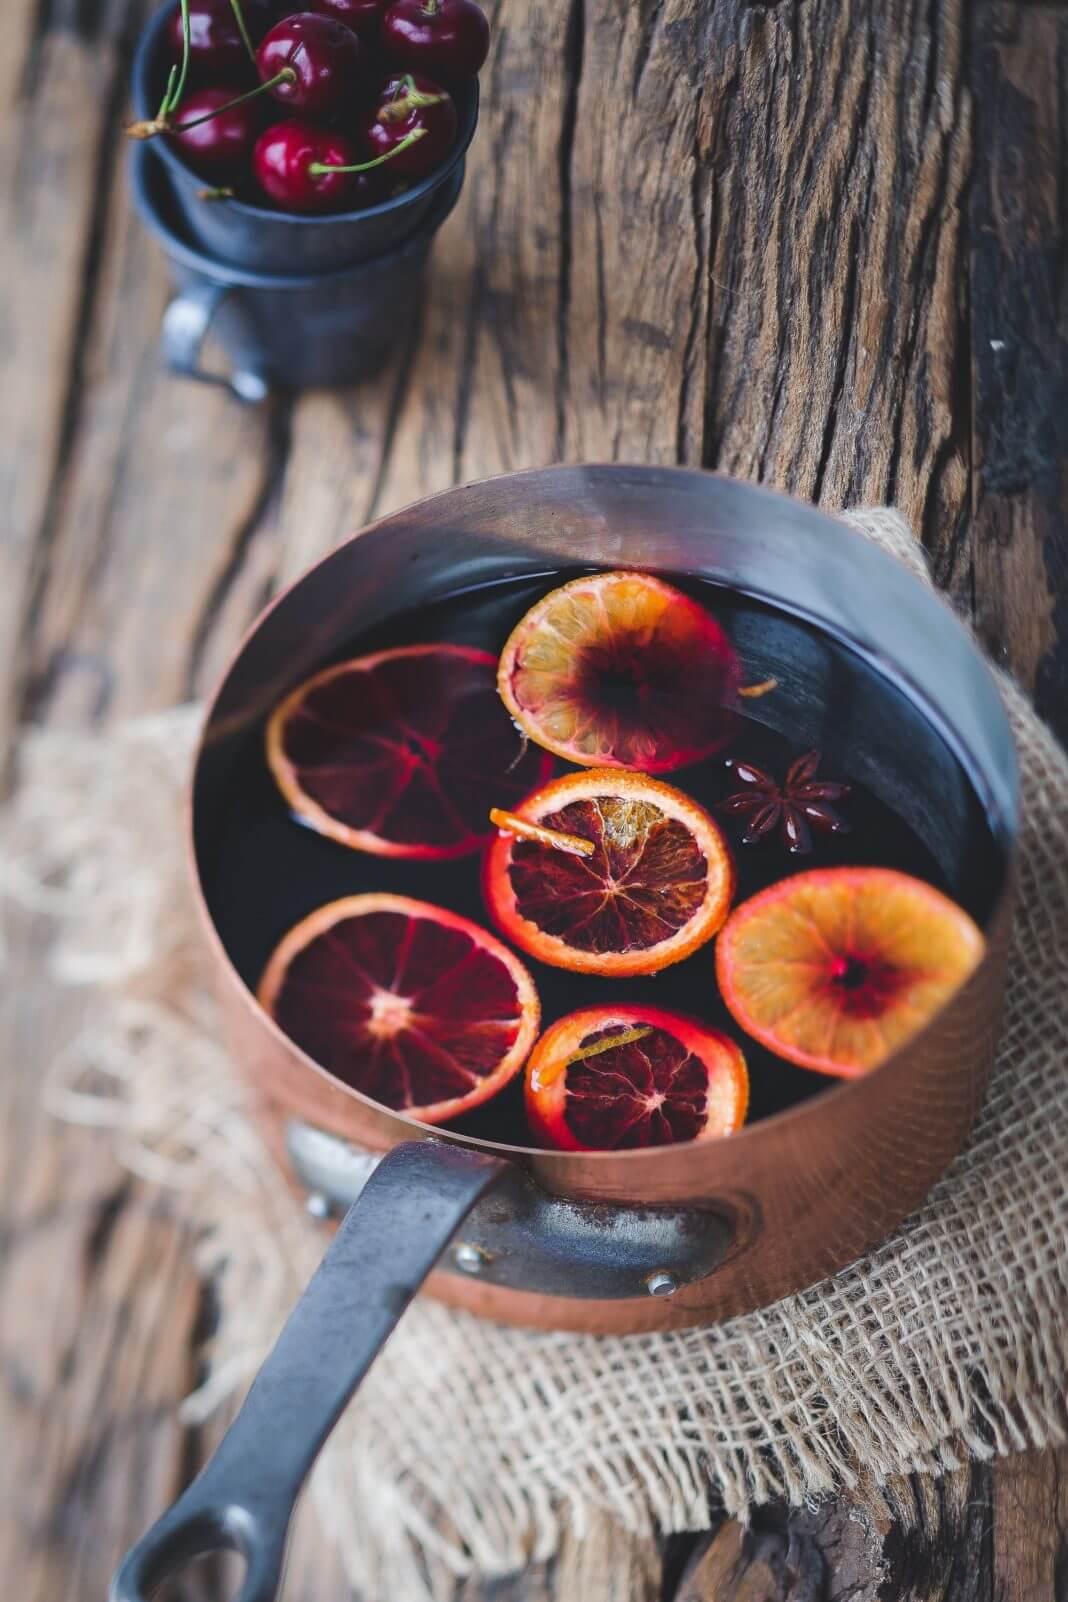 Festa meneghina: vin brulè